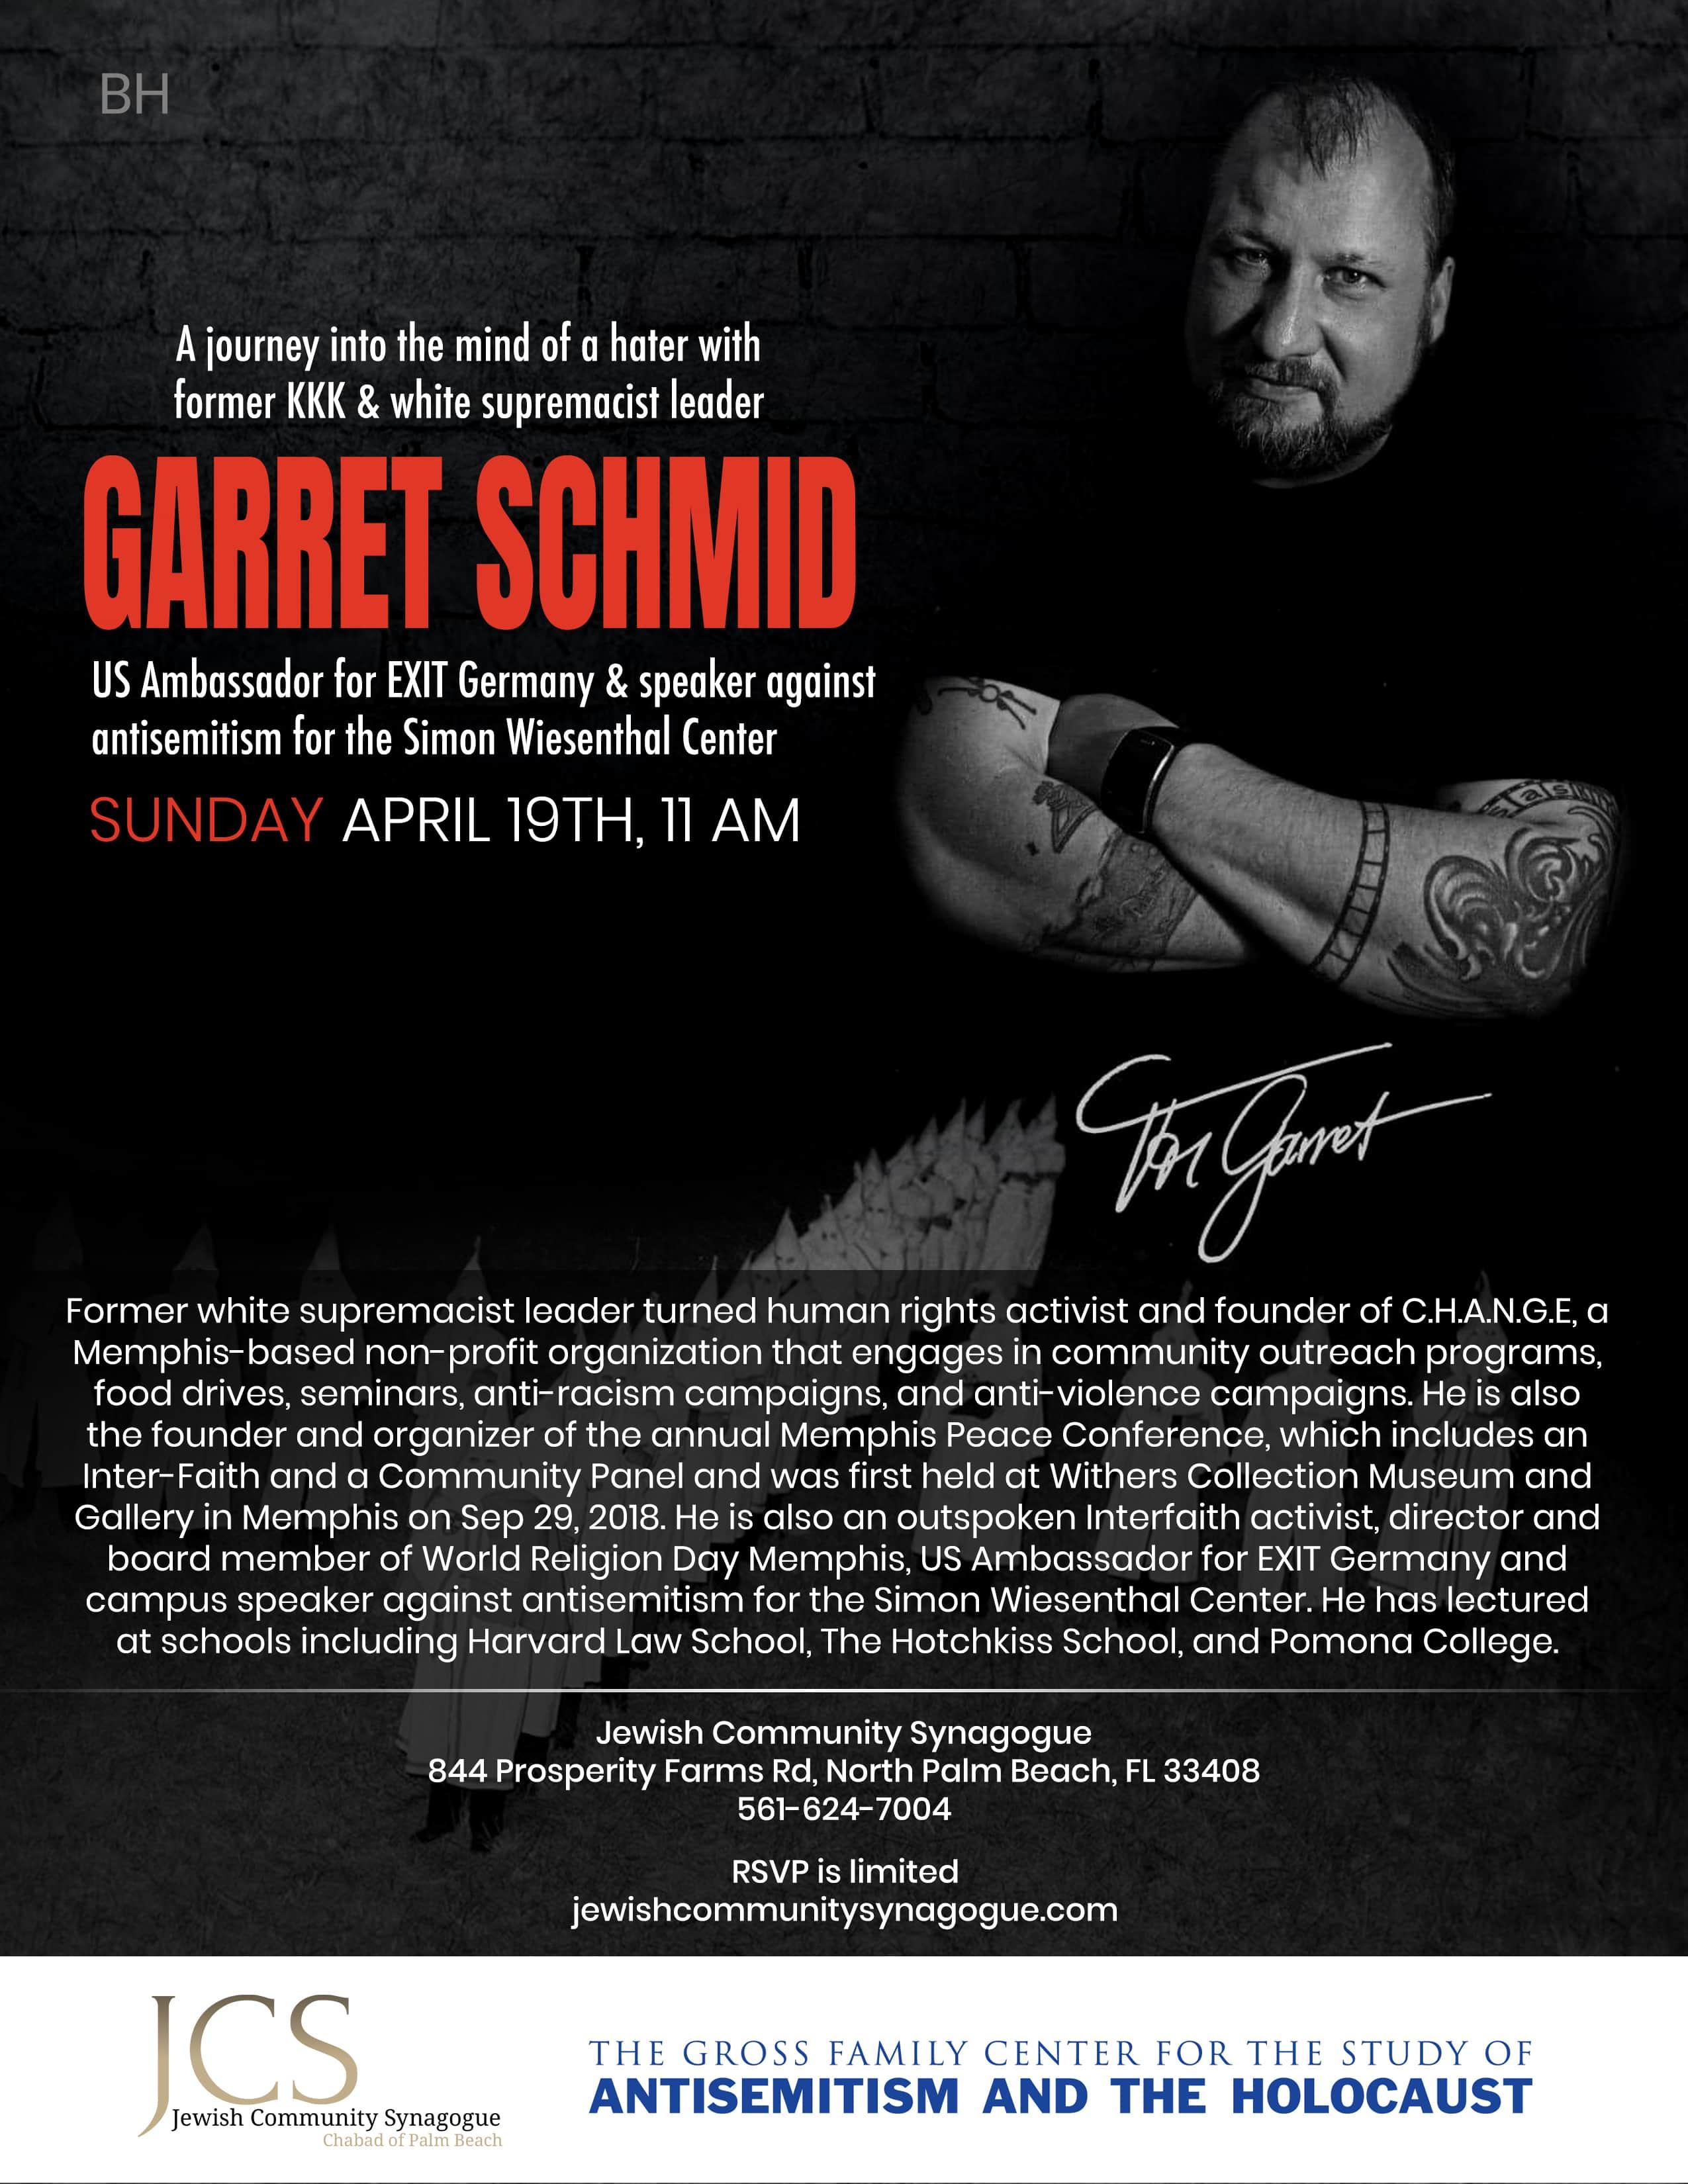 A journey into the mind of a hater with former KKK & white supremacist leader Garret Schmid